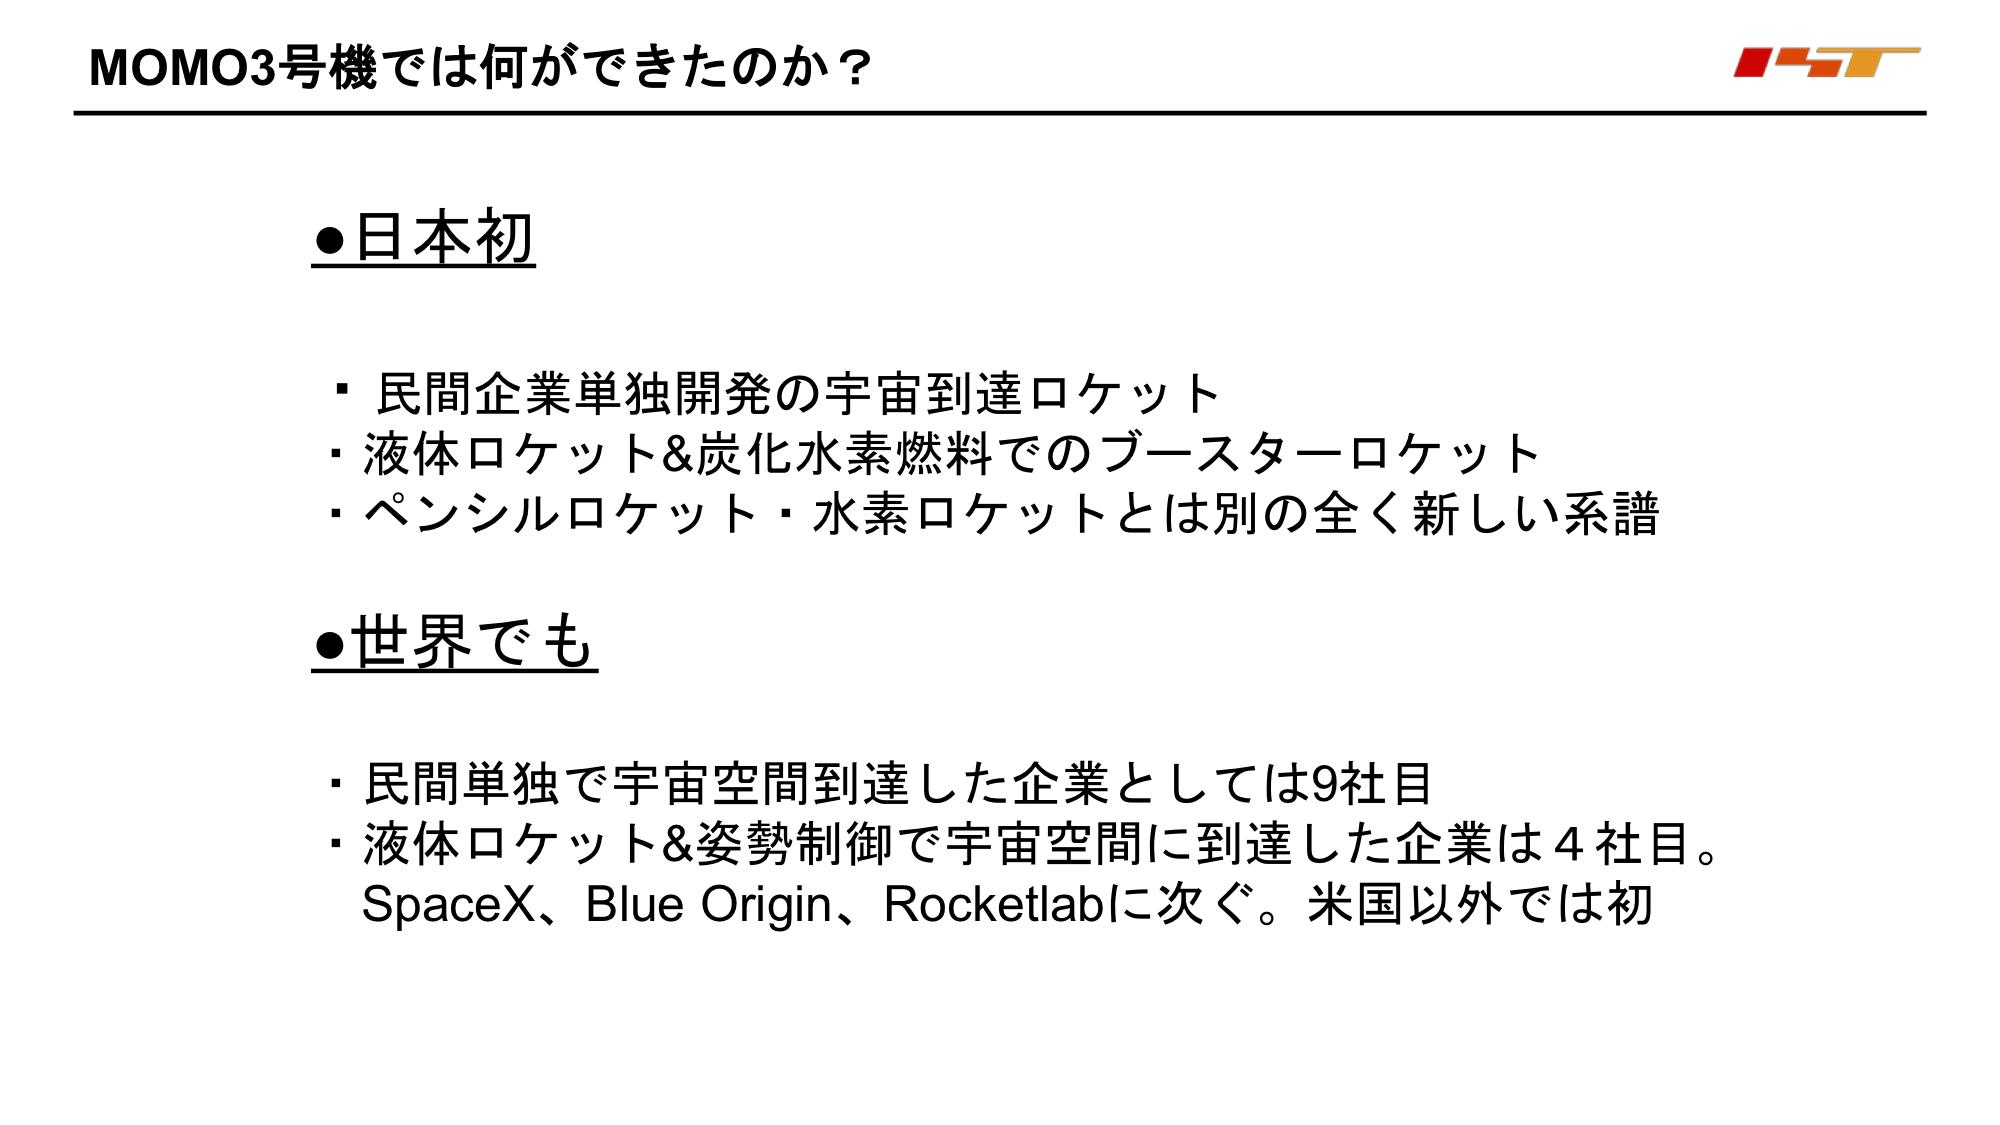 f:id:Imamura:20190628161040p:plain